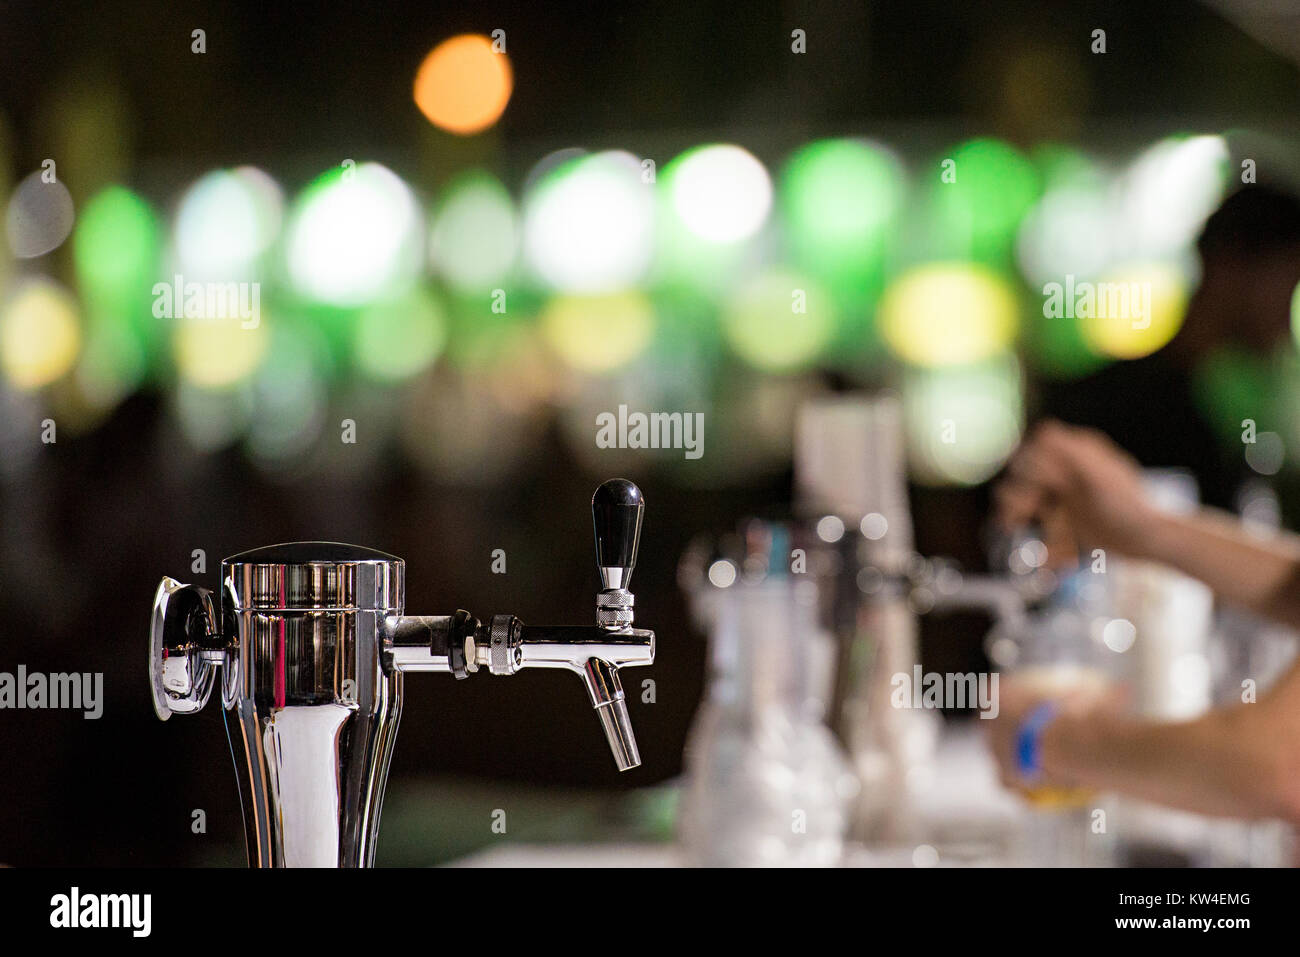 Dispensing draft beer in a bar from beer dispenser - Stock Image